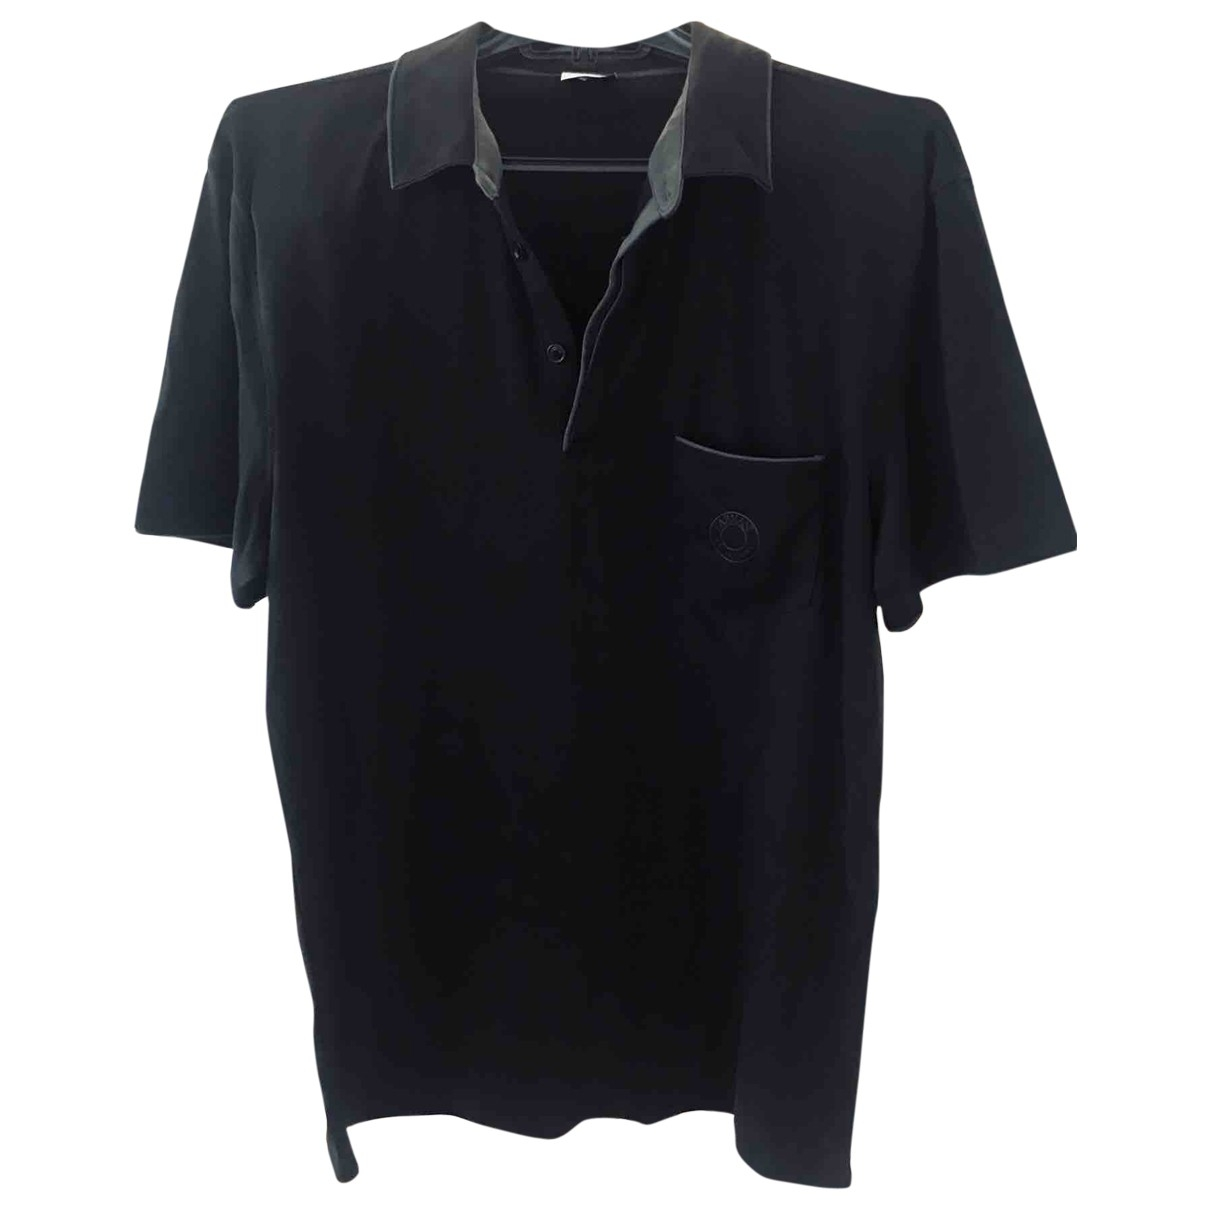 Armani Collezioni \N T-Shirts in  Schwarz Baumwolle